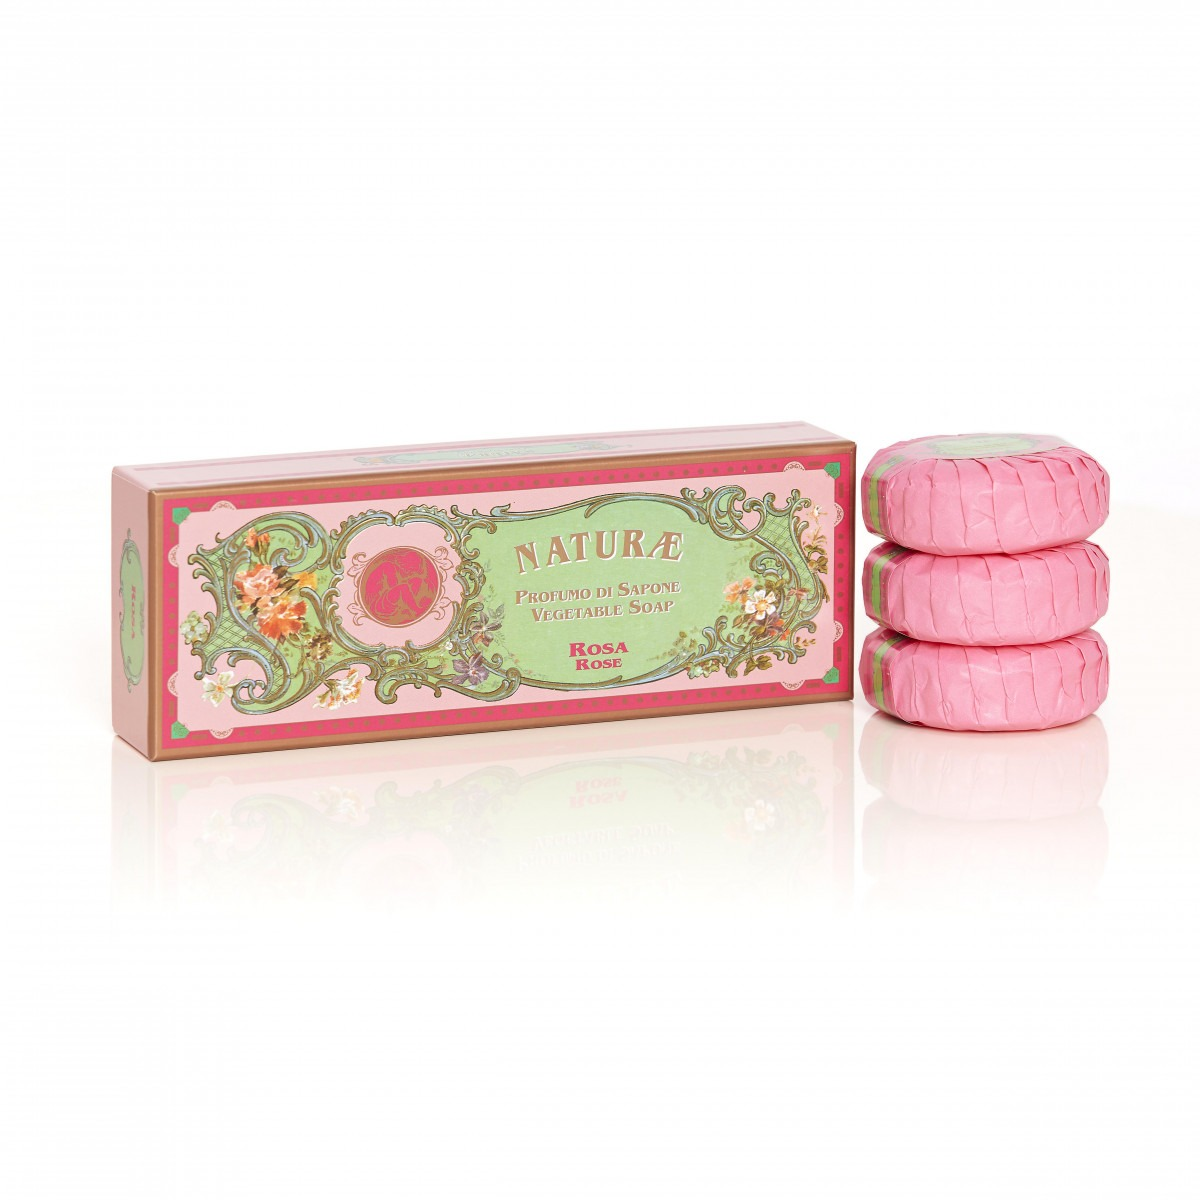 Naturae By Franco Zarri Rose Box Of 3 Soaps